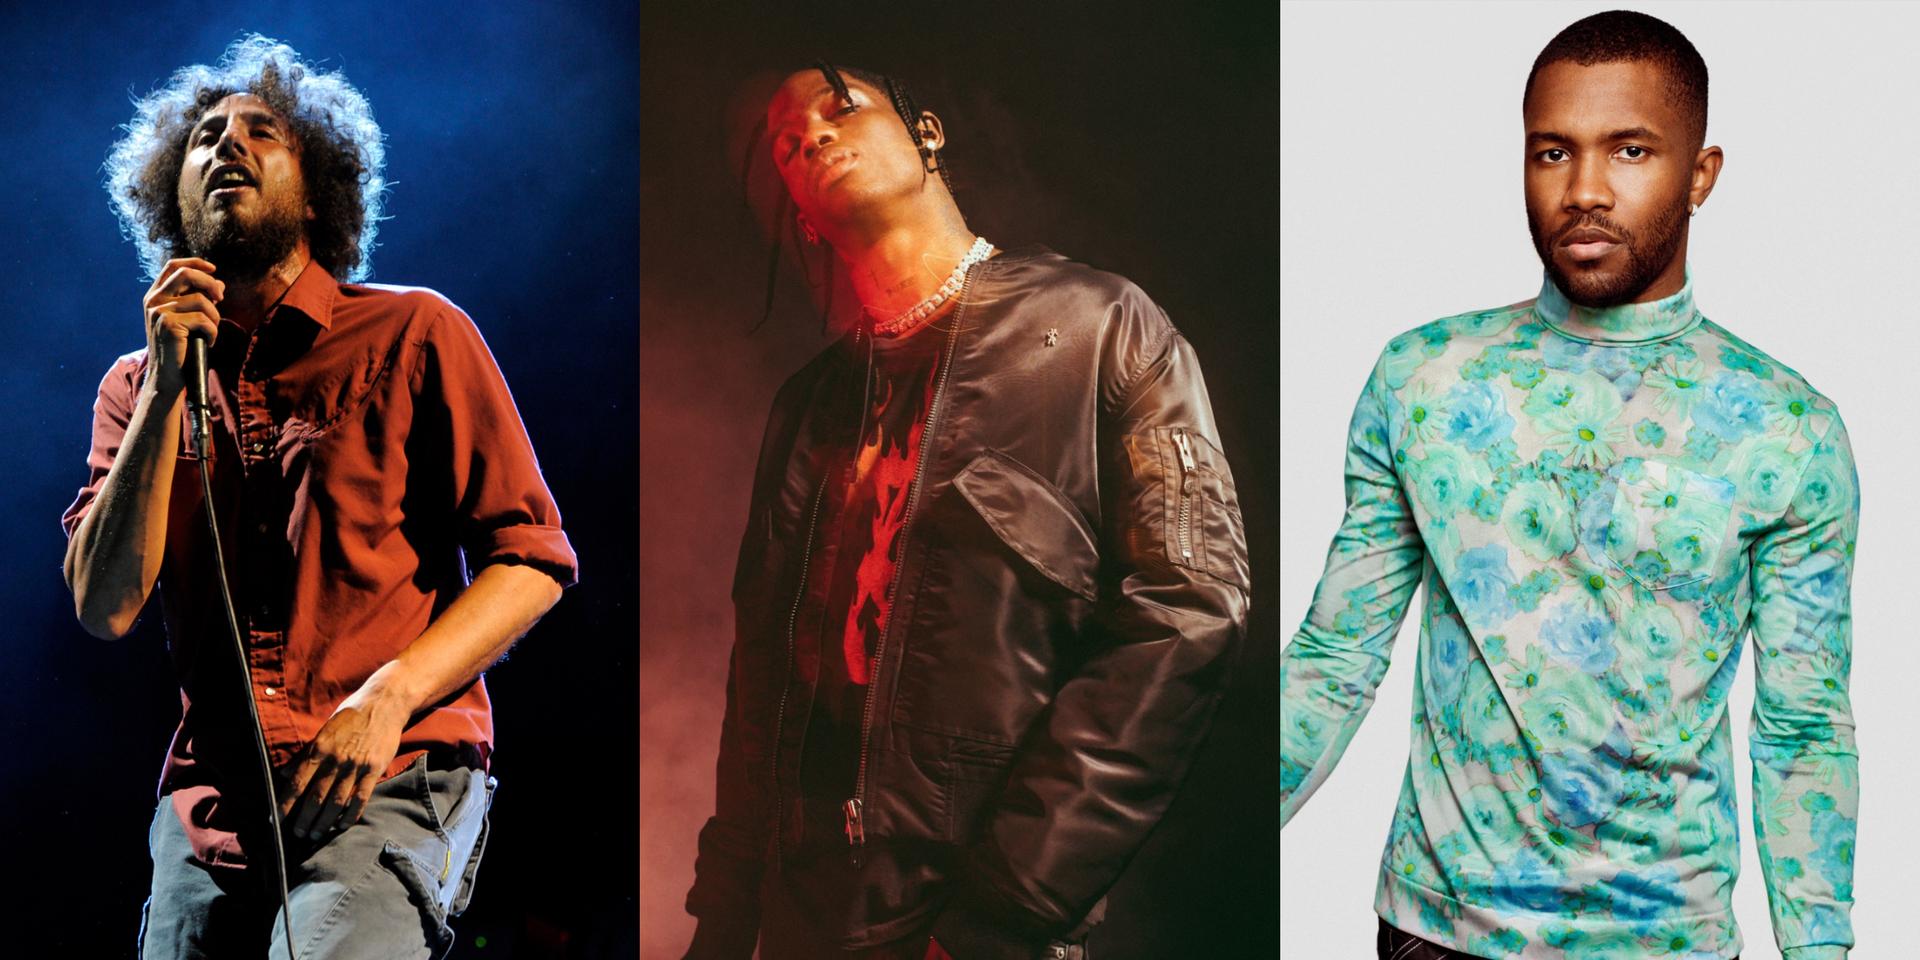 Coachella 2020 line-up announced – Rage Against The Machine, Travis Scott, and Frank Ocean to headline